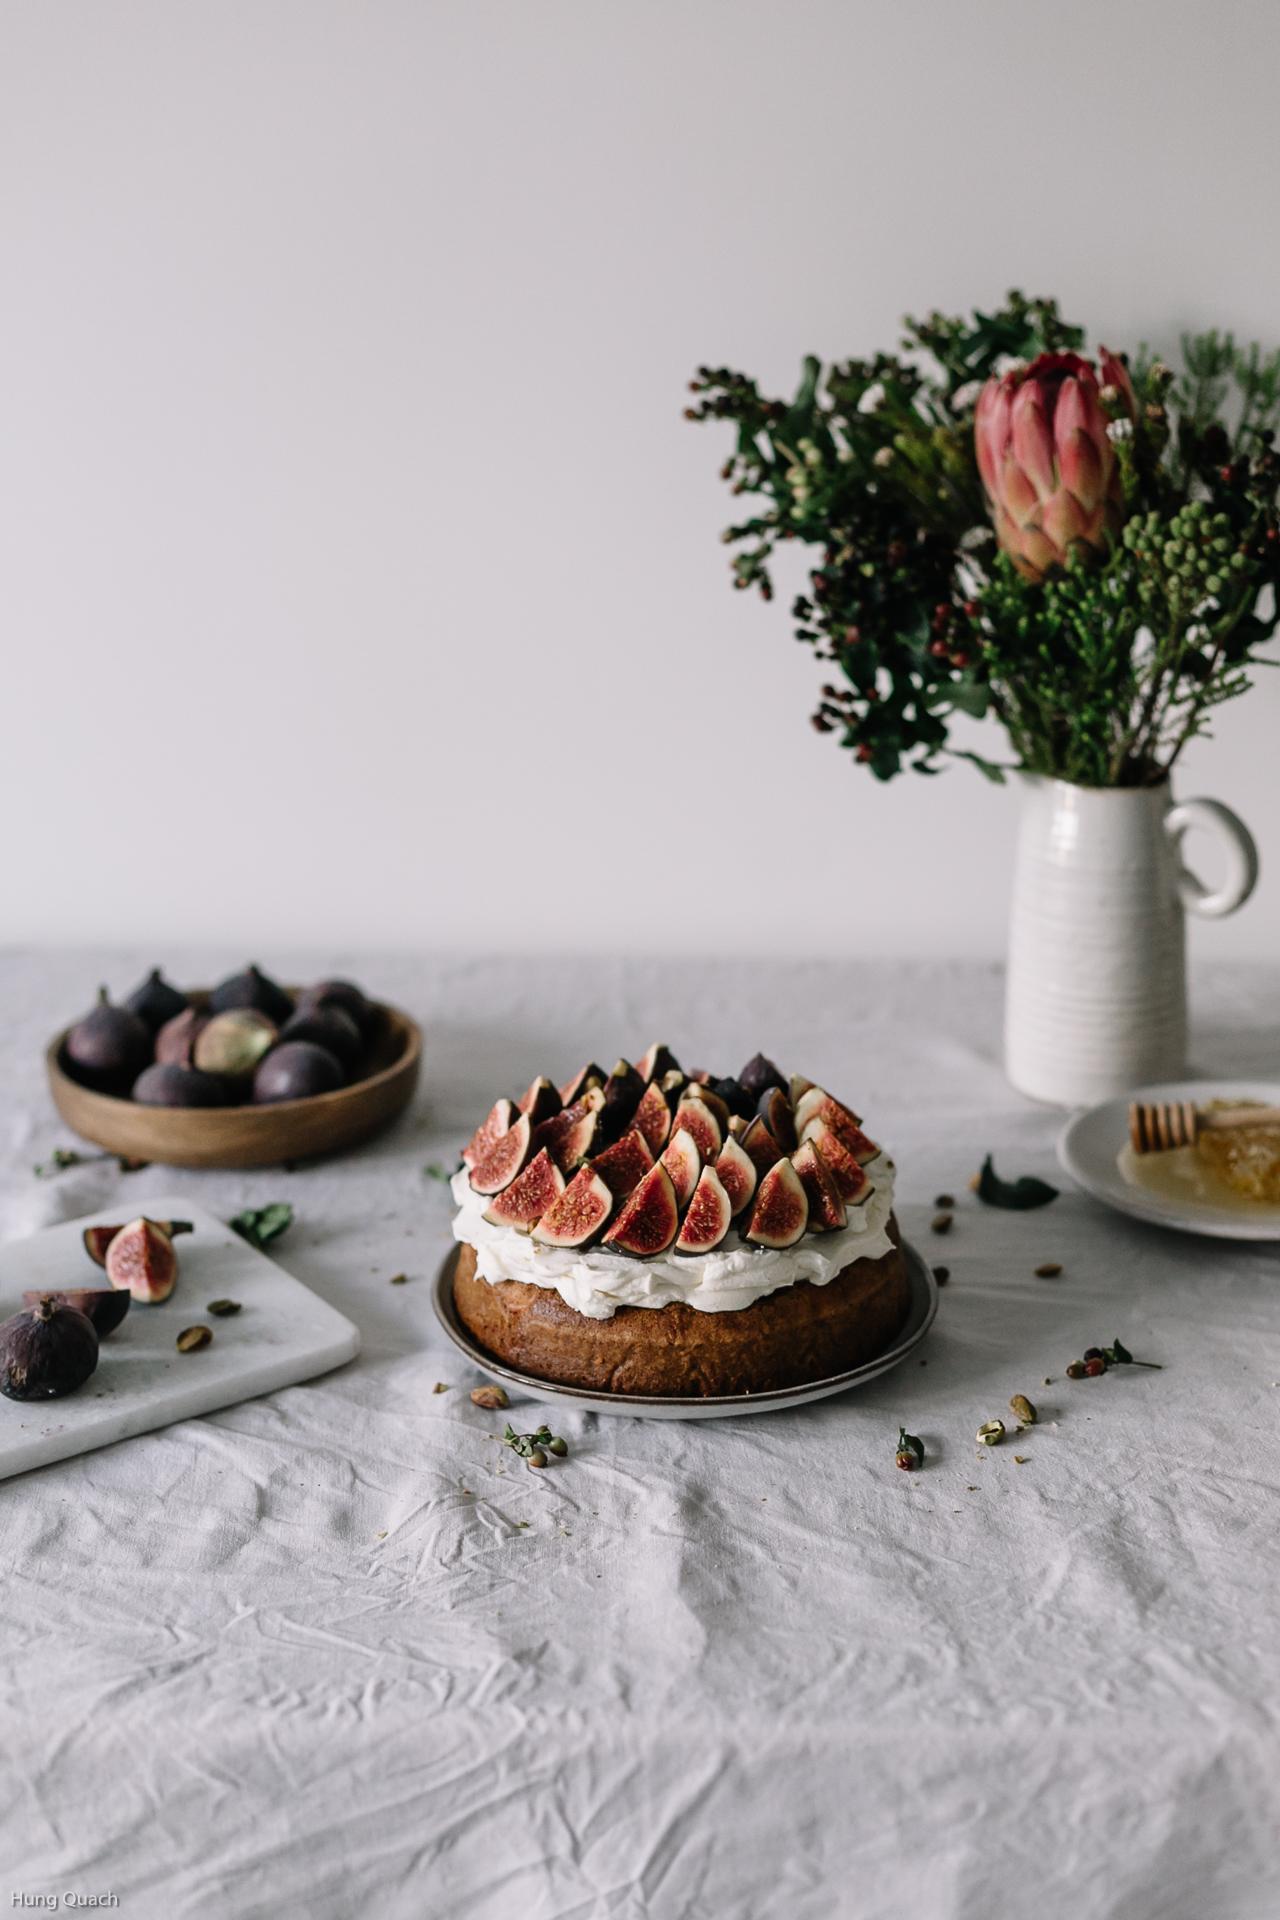 OLIVE OIL & ORANGE CAKE - TORTA ALL'OLIO D'OLIVA E ARANCE - OPSD blog - Guest Post - Jet and Indigo food blog - Guest Post for OPSD blog